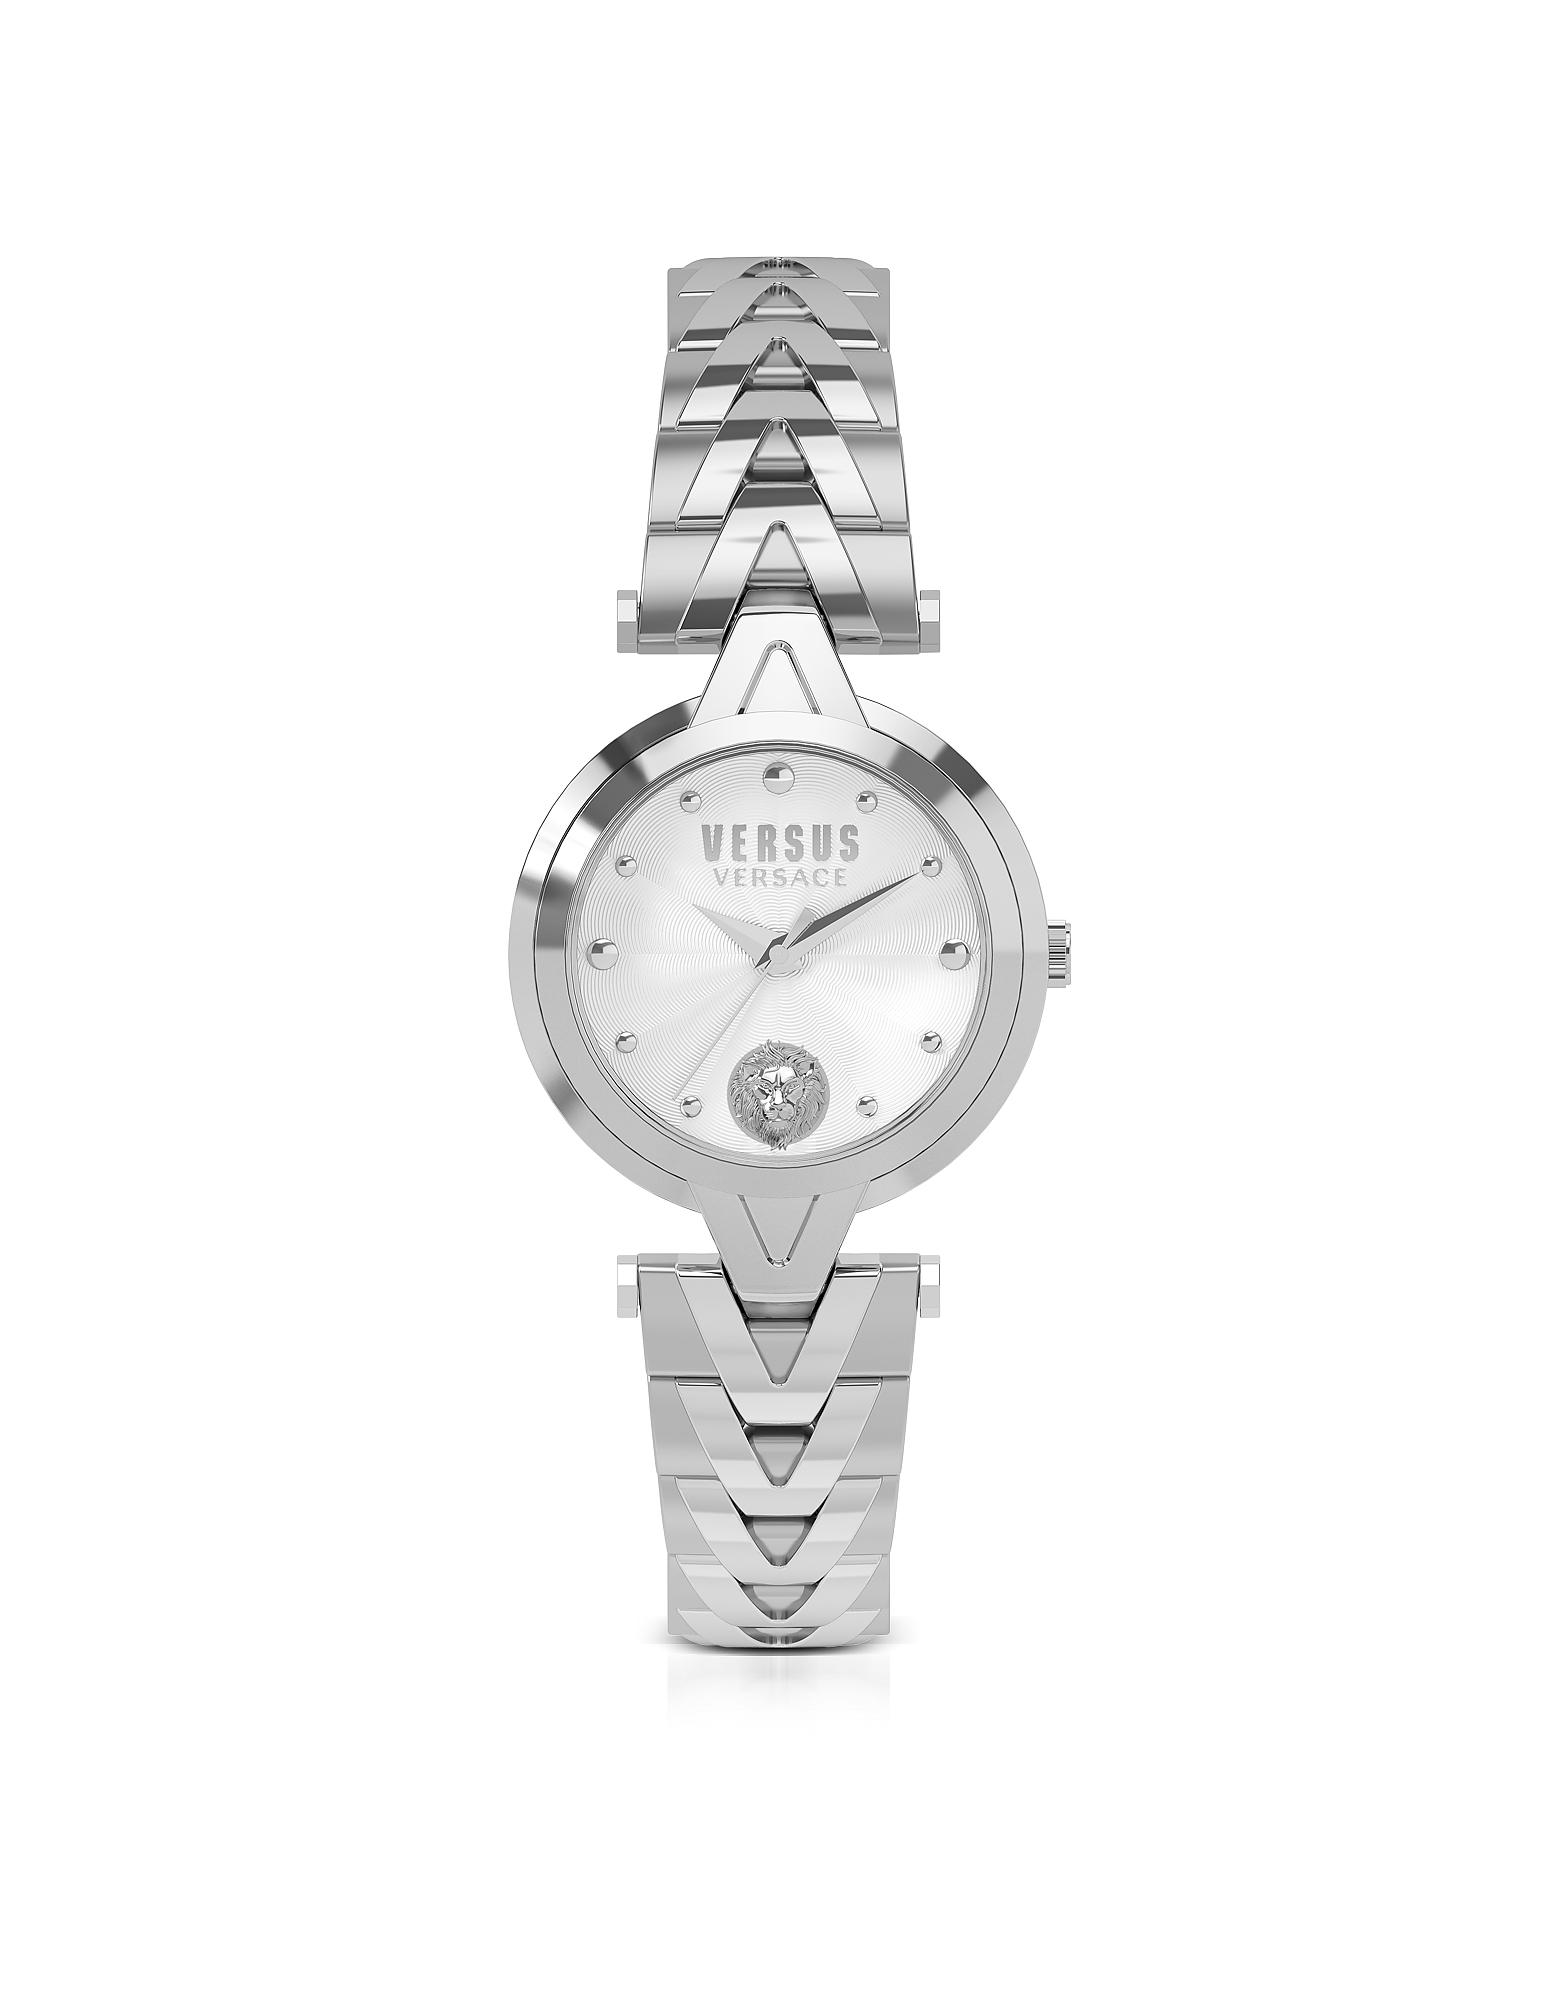 V Versus Silver Stainless Steel Women's Bracelet Watch